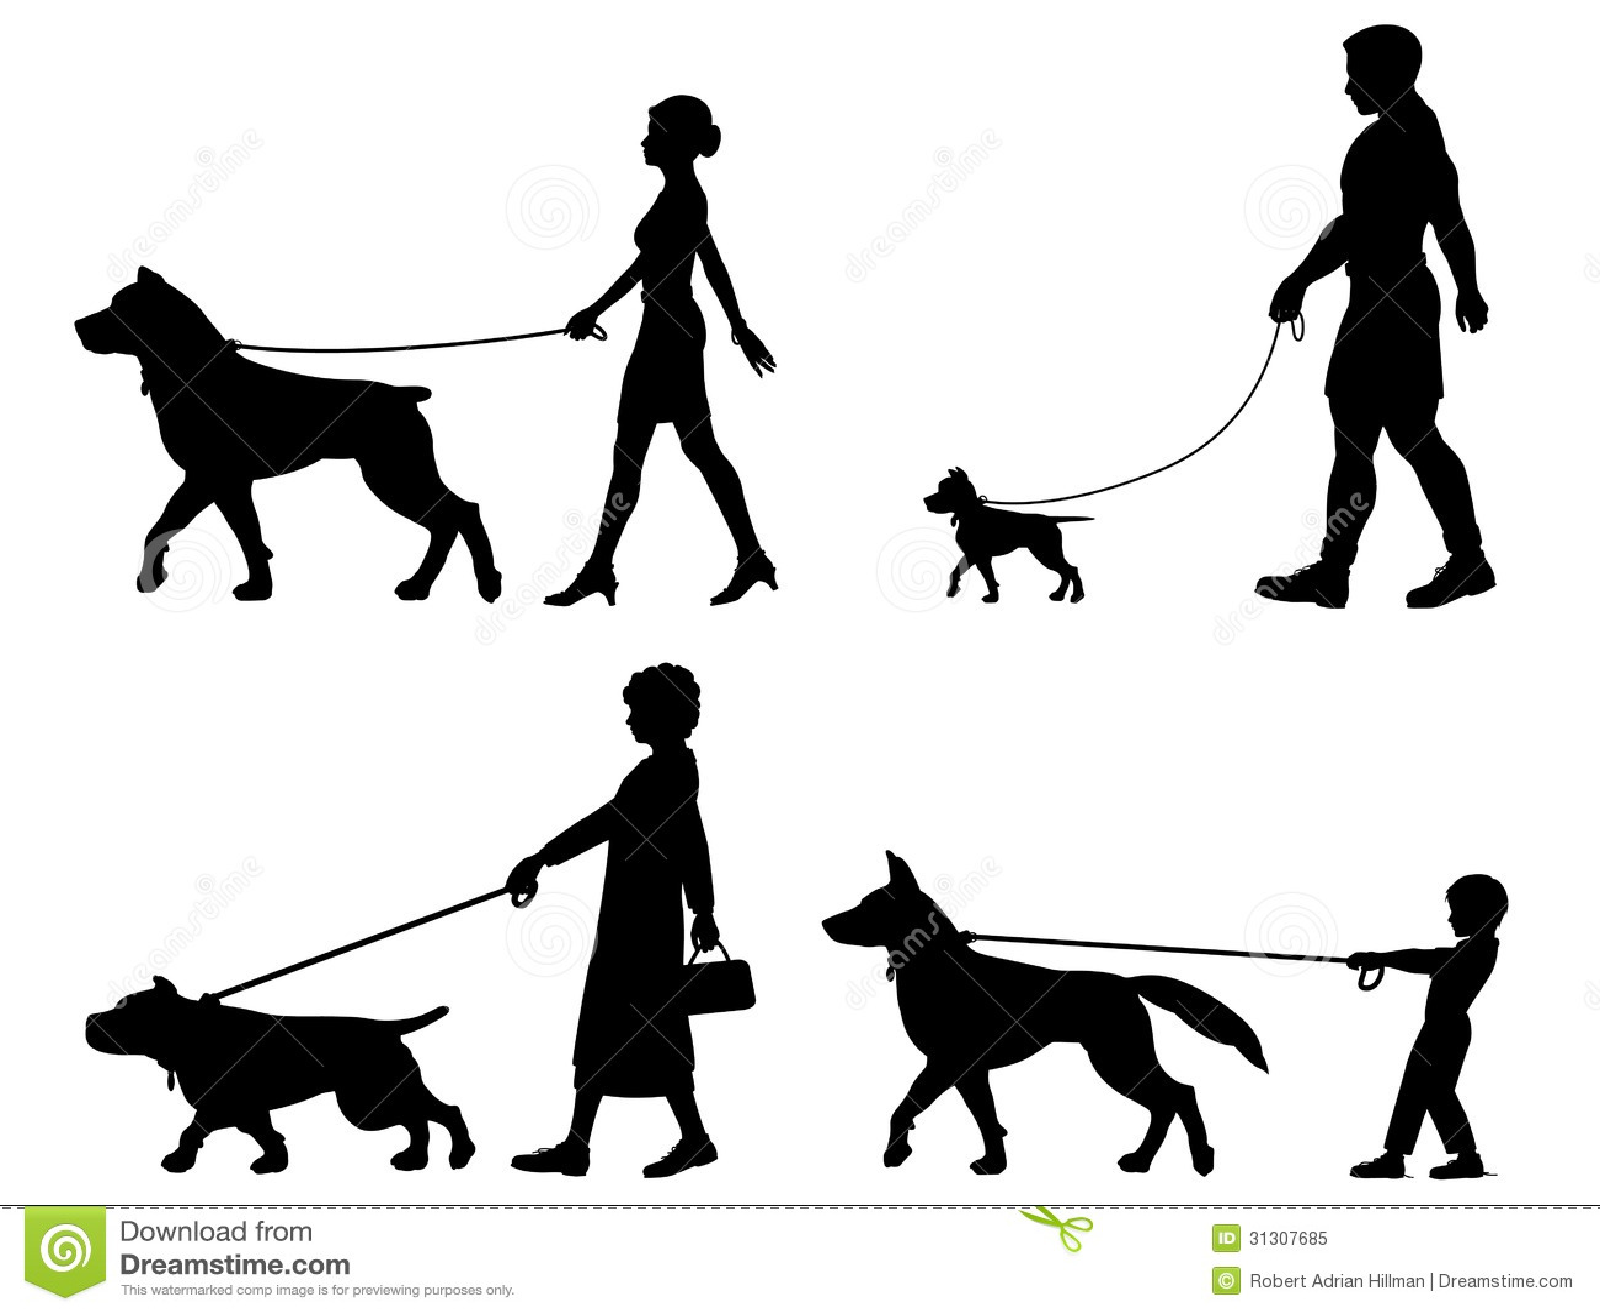 Dog Owner Variety Royalty Free Stock Photo Image 31307685